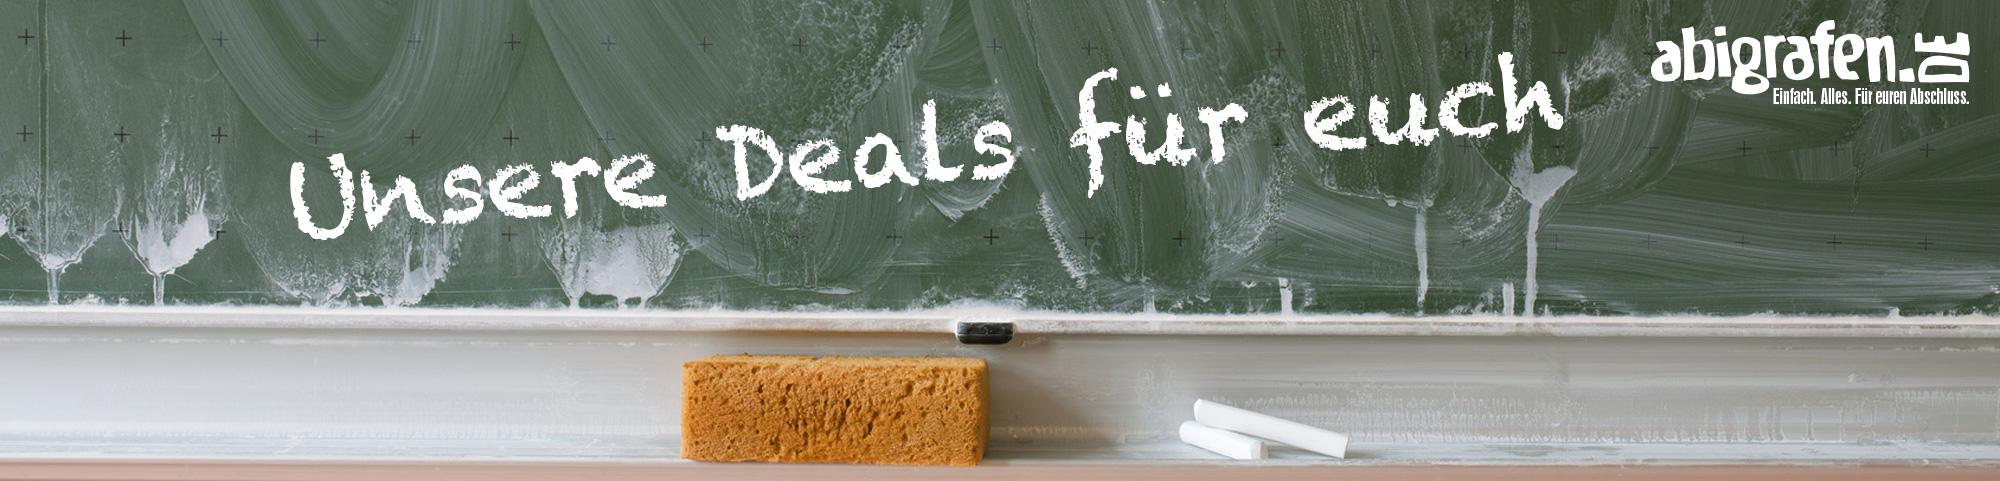 Angebote, Rabatte & Deals bei abigrafen.de